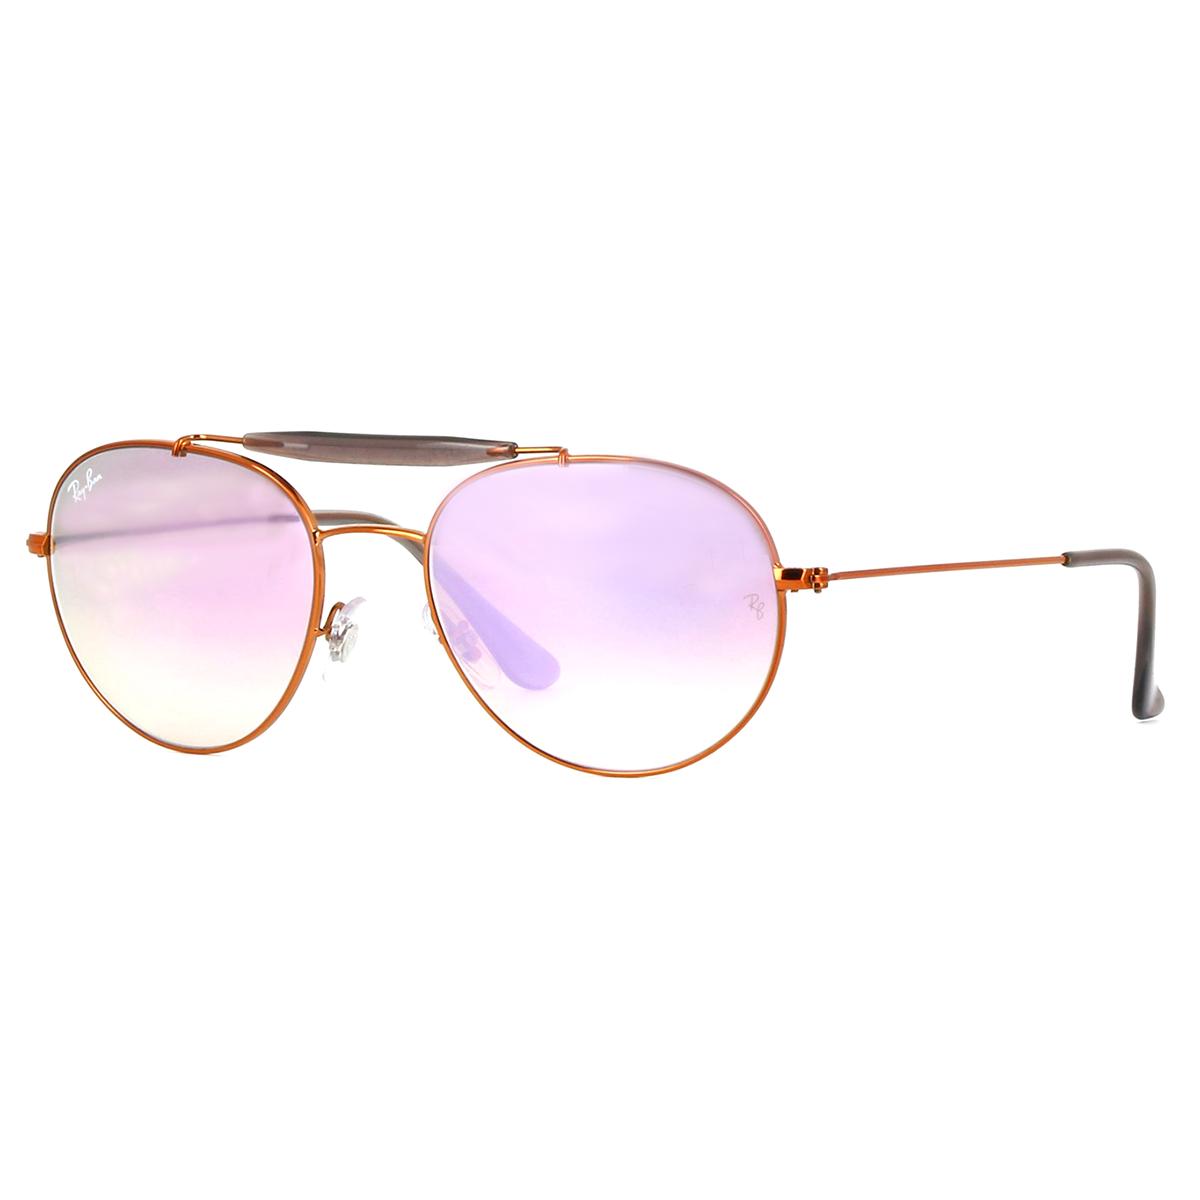 68368c95f9344 Óculos de Sol RayBan RB3540 Azul   Tri-Jóia Shop